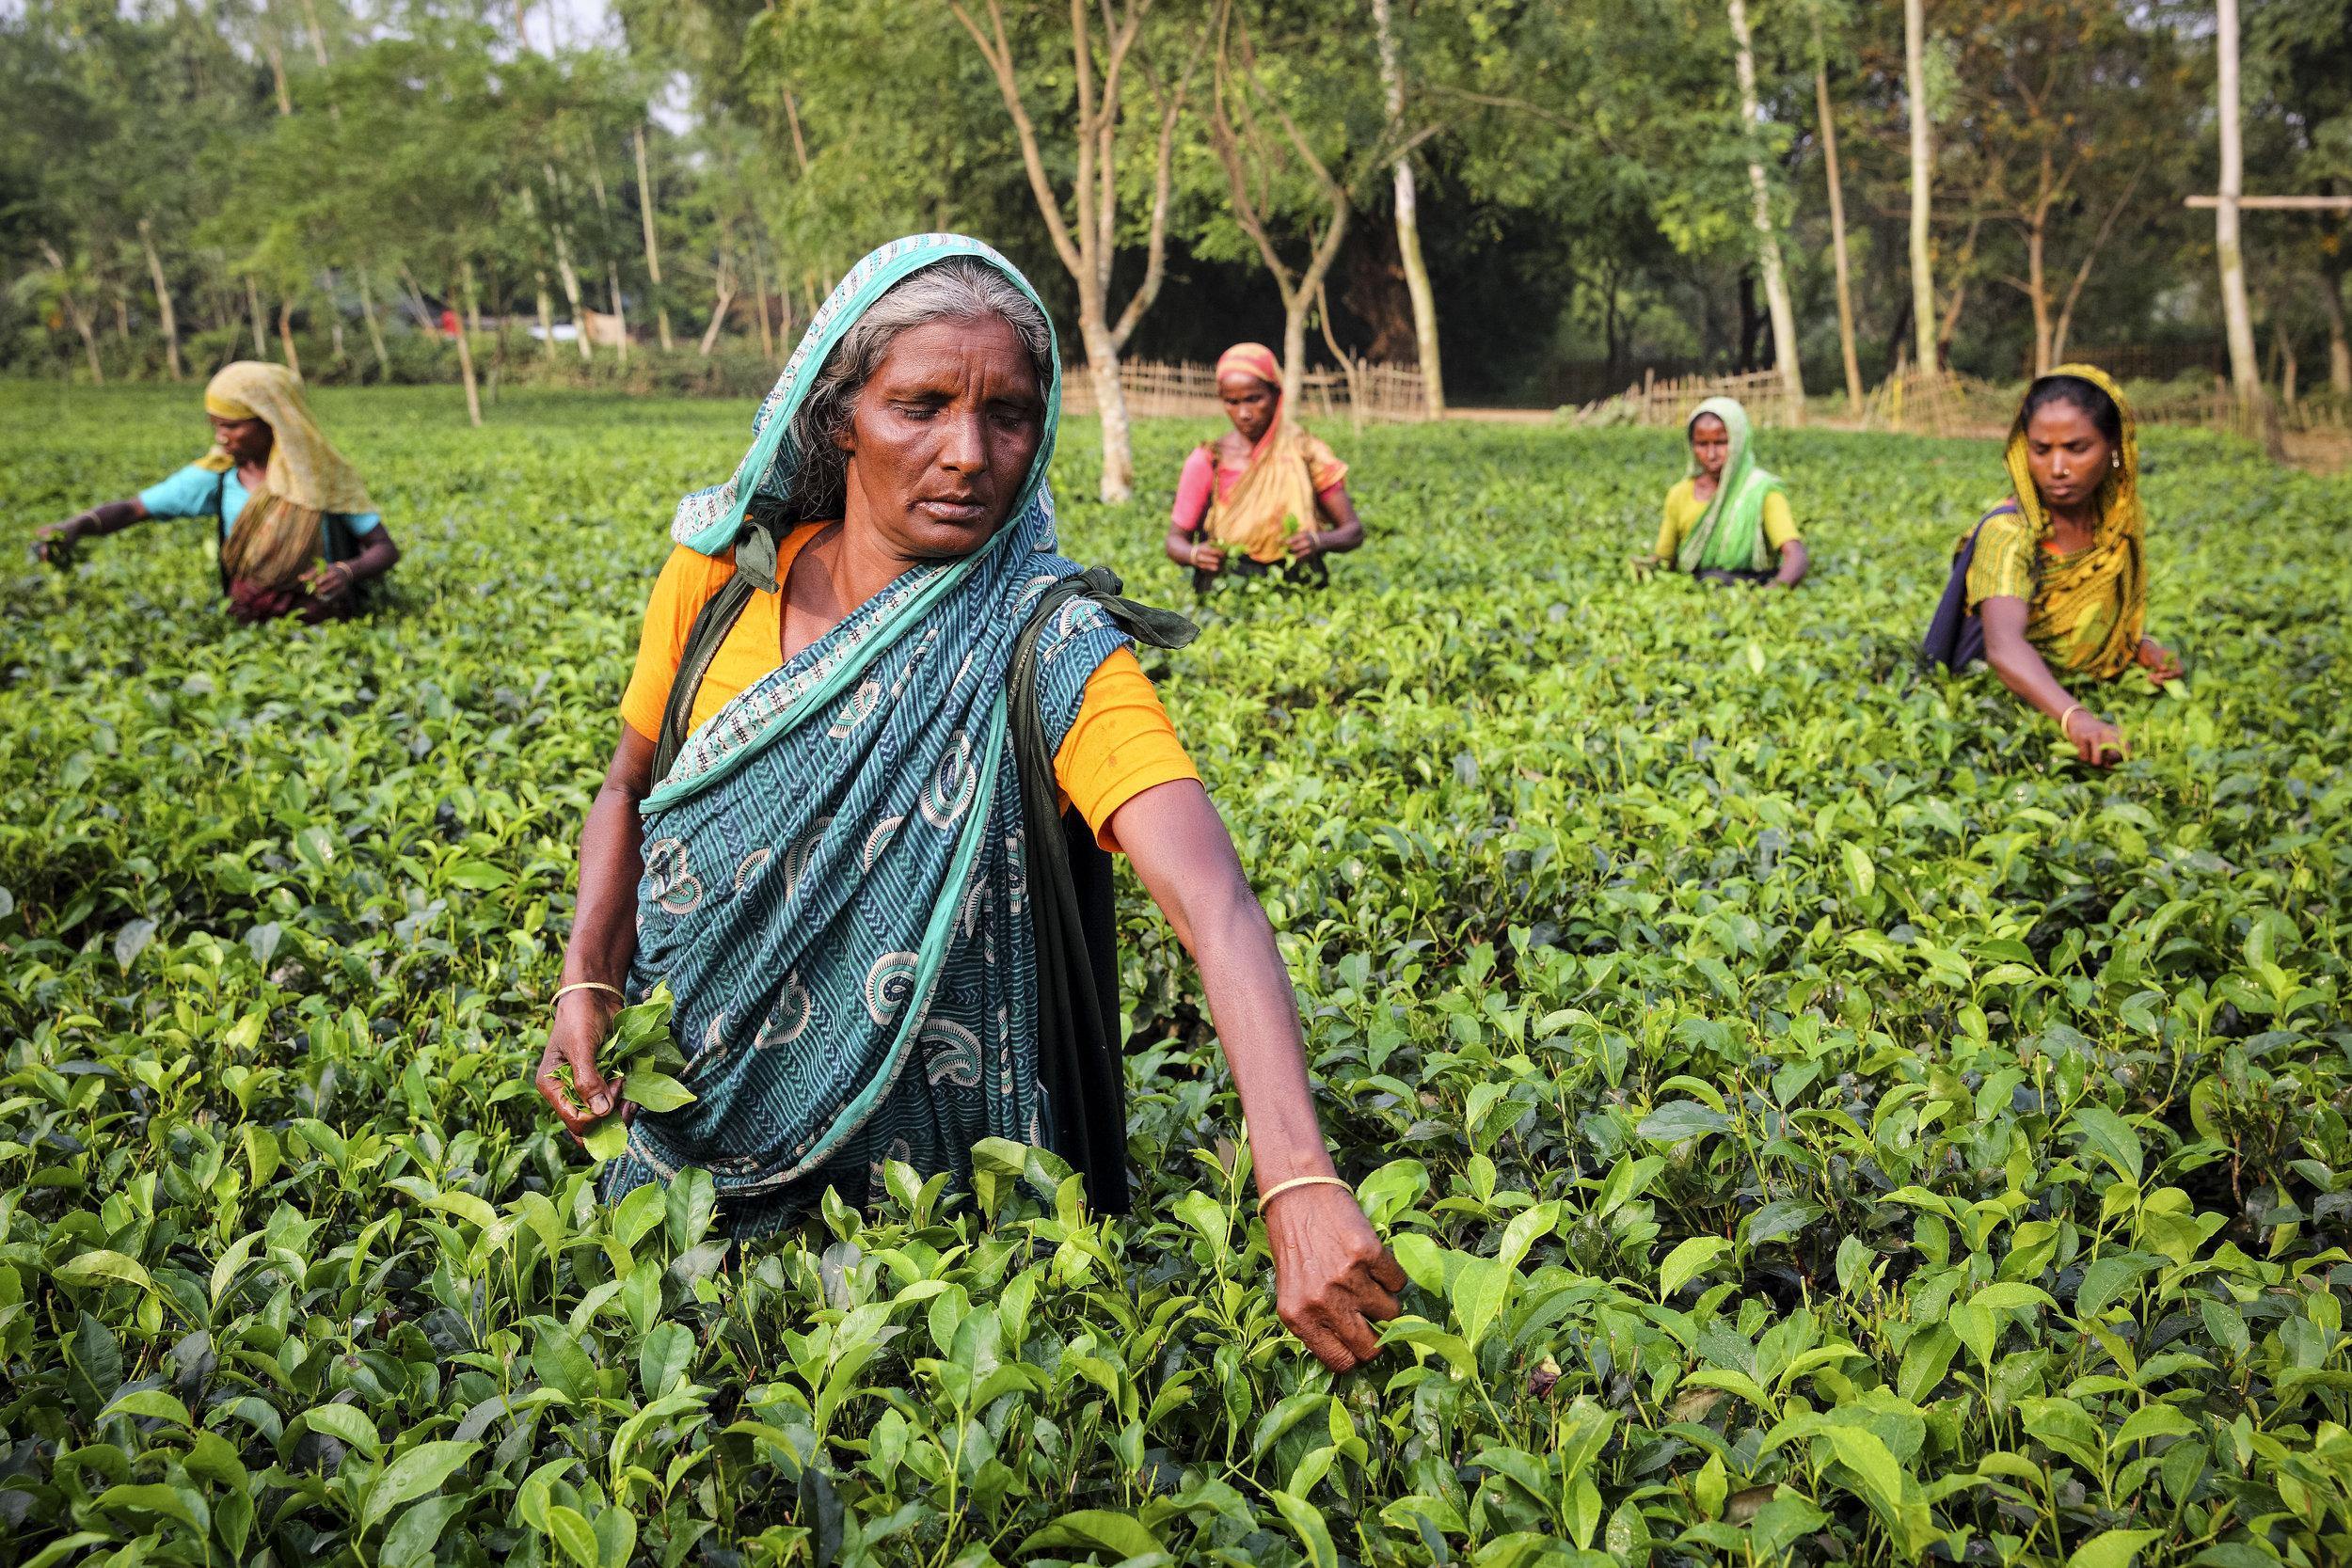 Jamiron, who took part in Traidcraft Exchange's EqualiTea project in Bangladesh, working in a tea garden. Credit: Traidcraft Exchange/GMB Akash